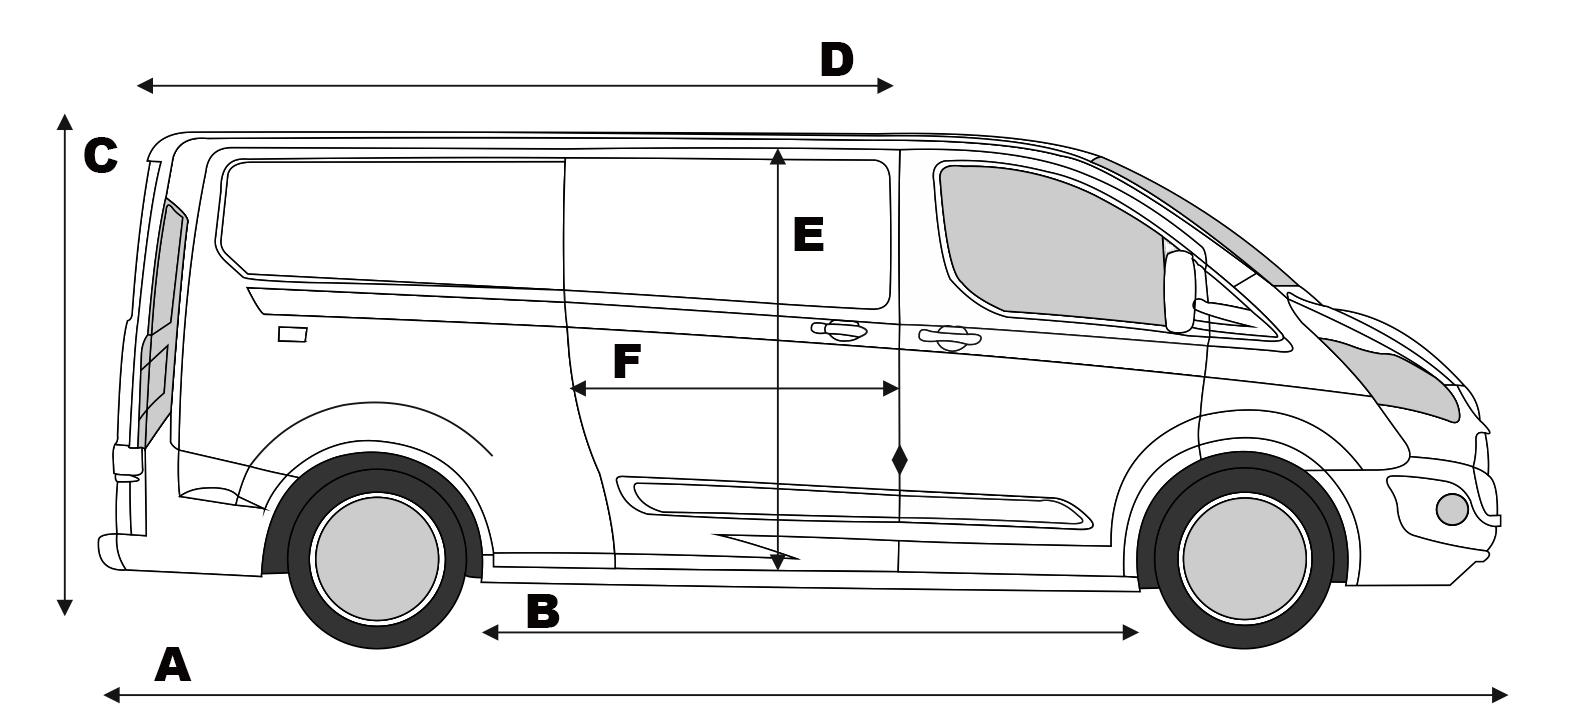 transit center ford transit custom sp cifications. Black Bedroom Furniture Sets. Home Design Ideas